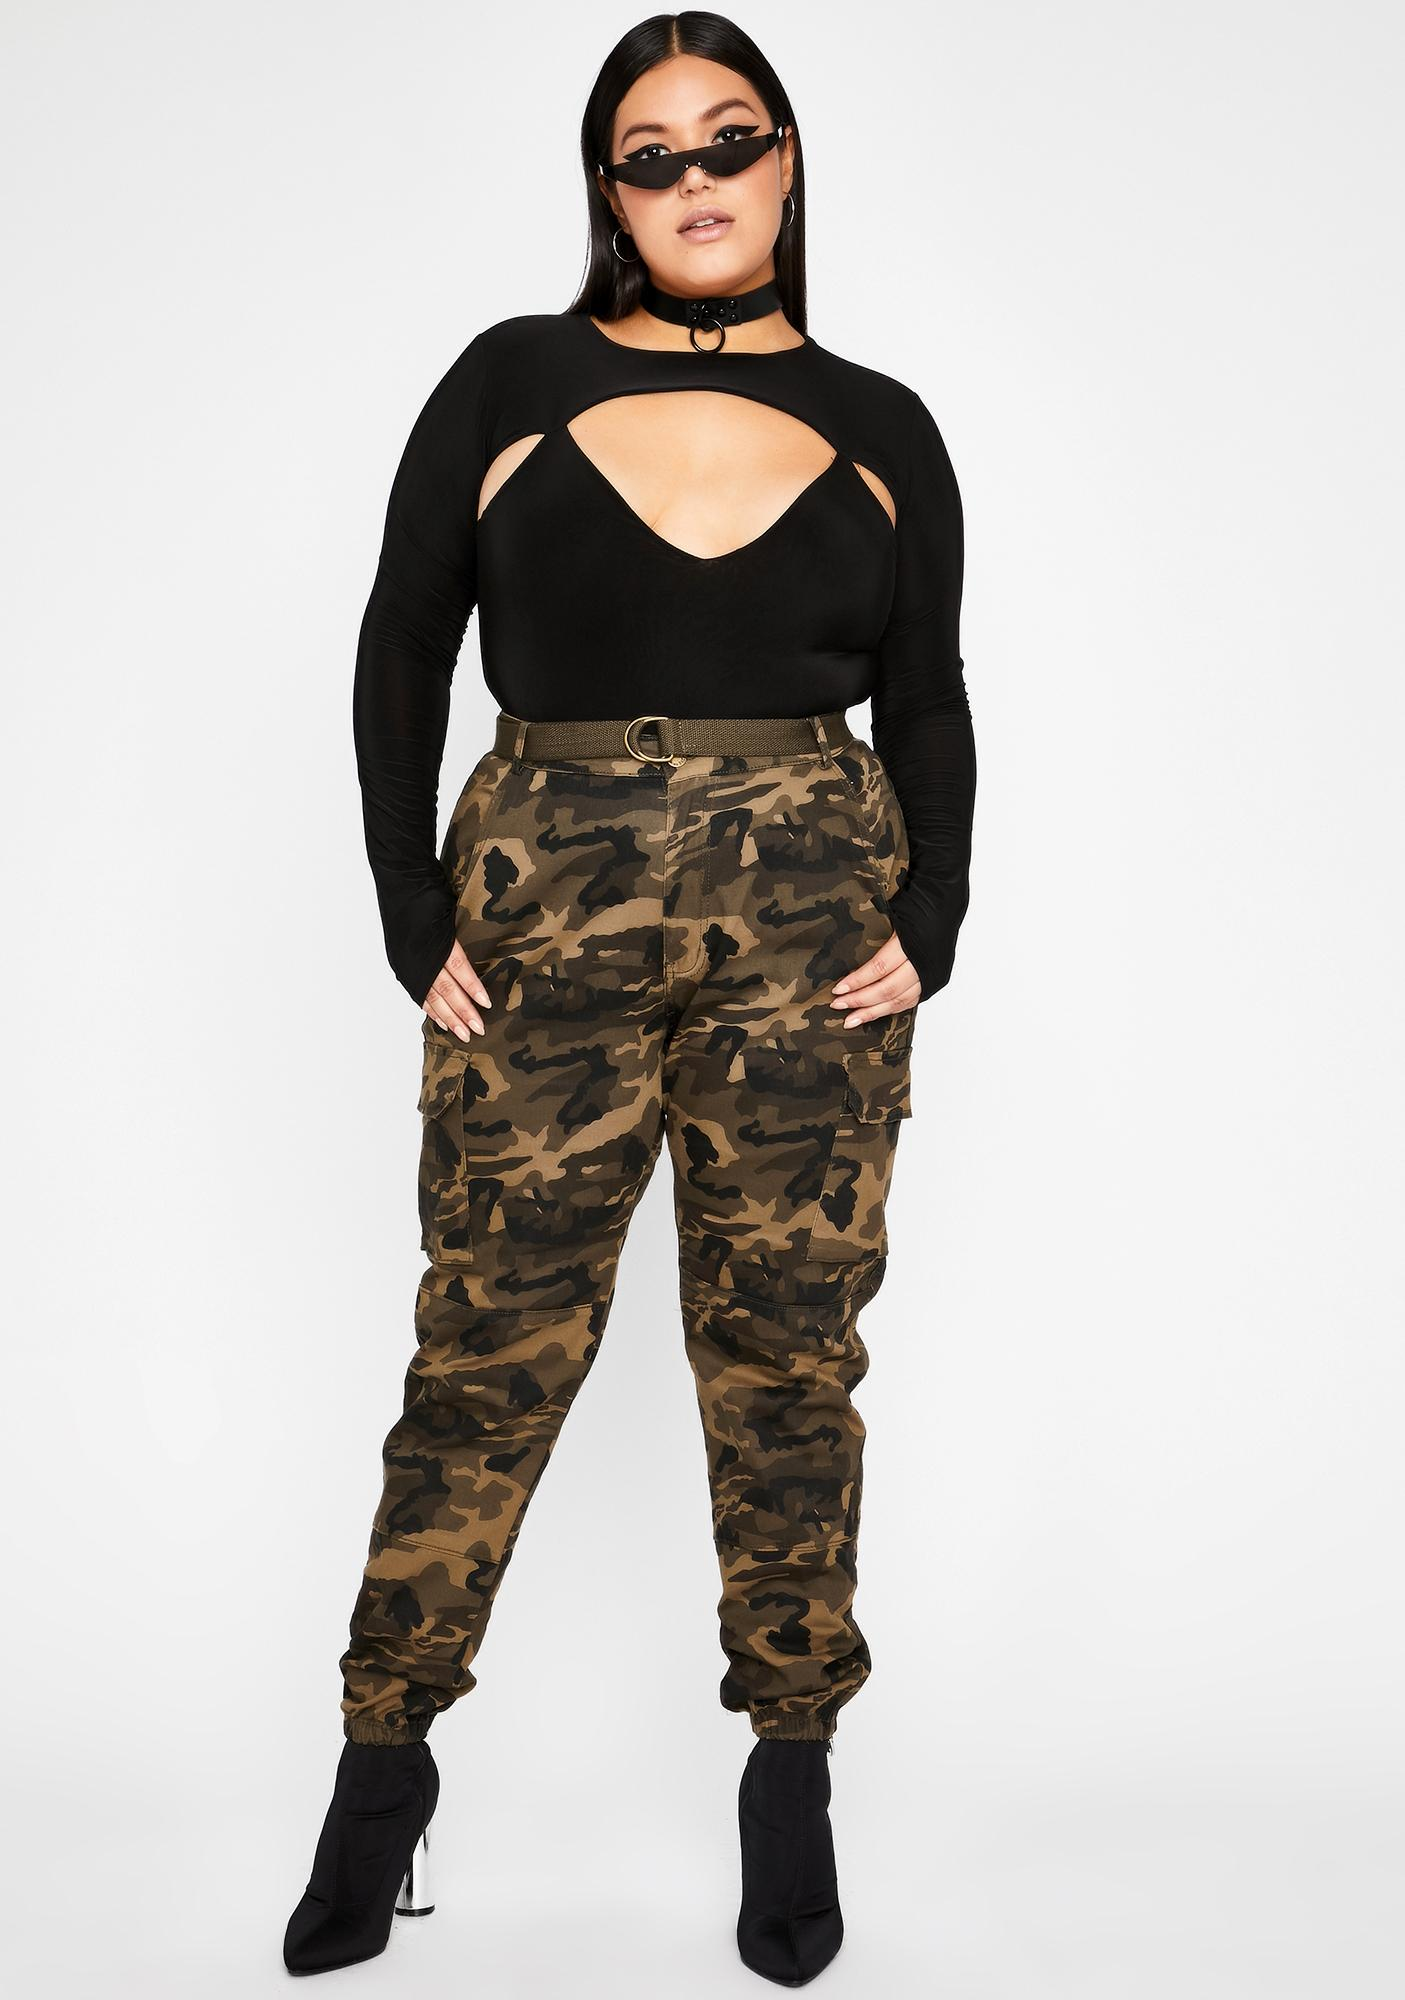 Gotta Real Bad Feeling Cutout Bodysuit